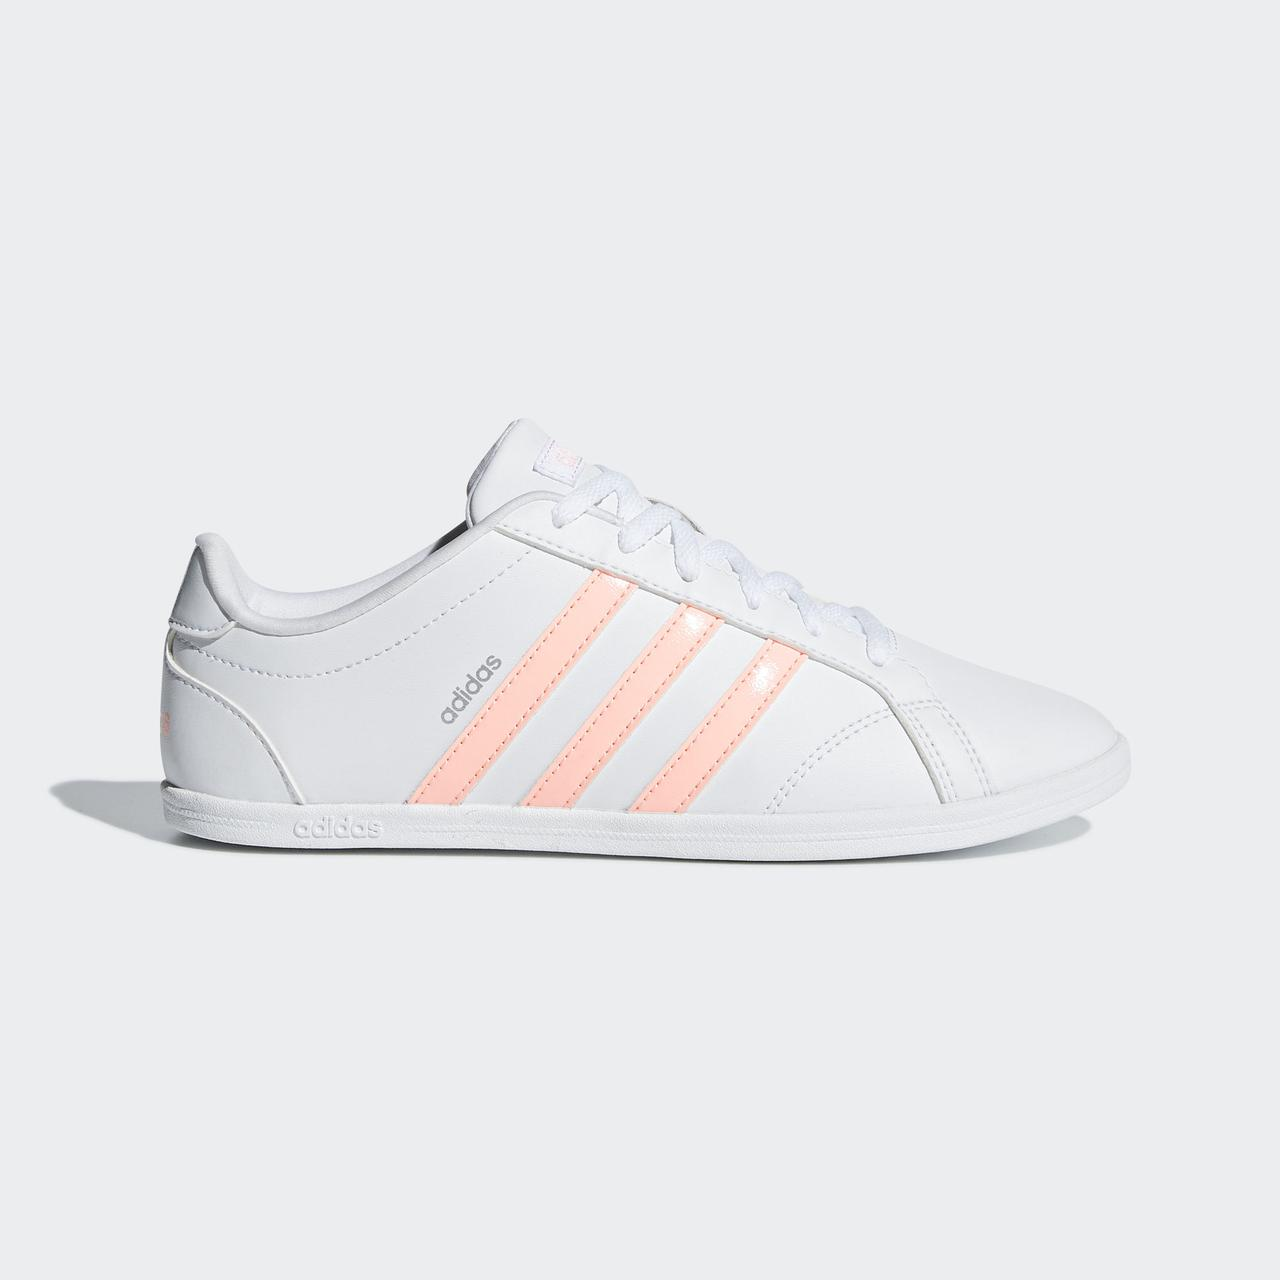 Женские кроссовки Adidas Neo VS Coneo QT (Артикул: B44682)